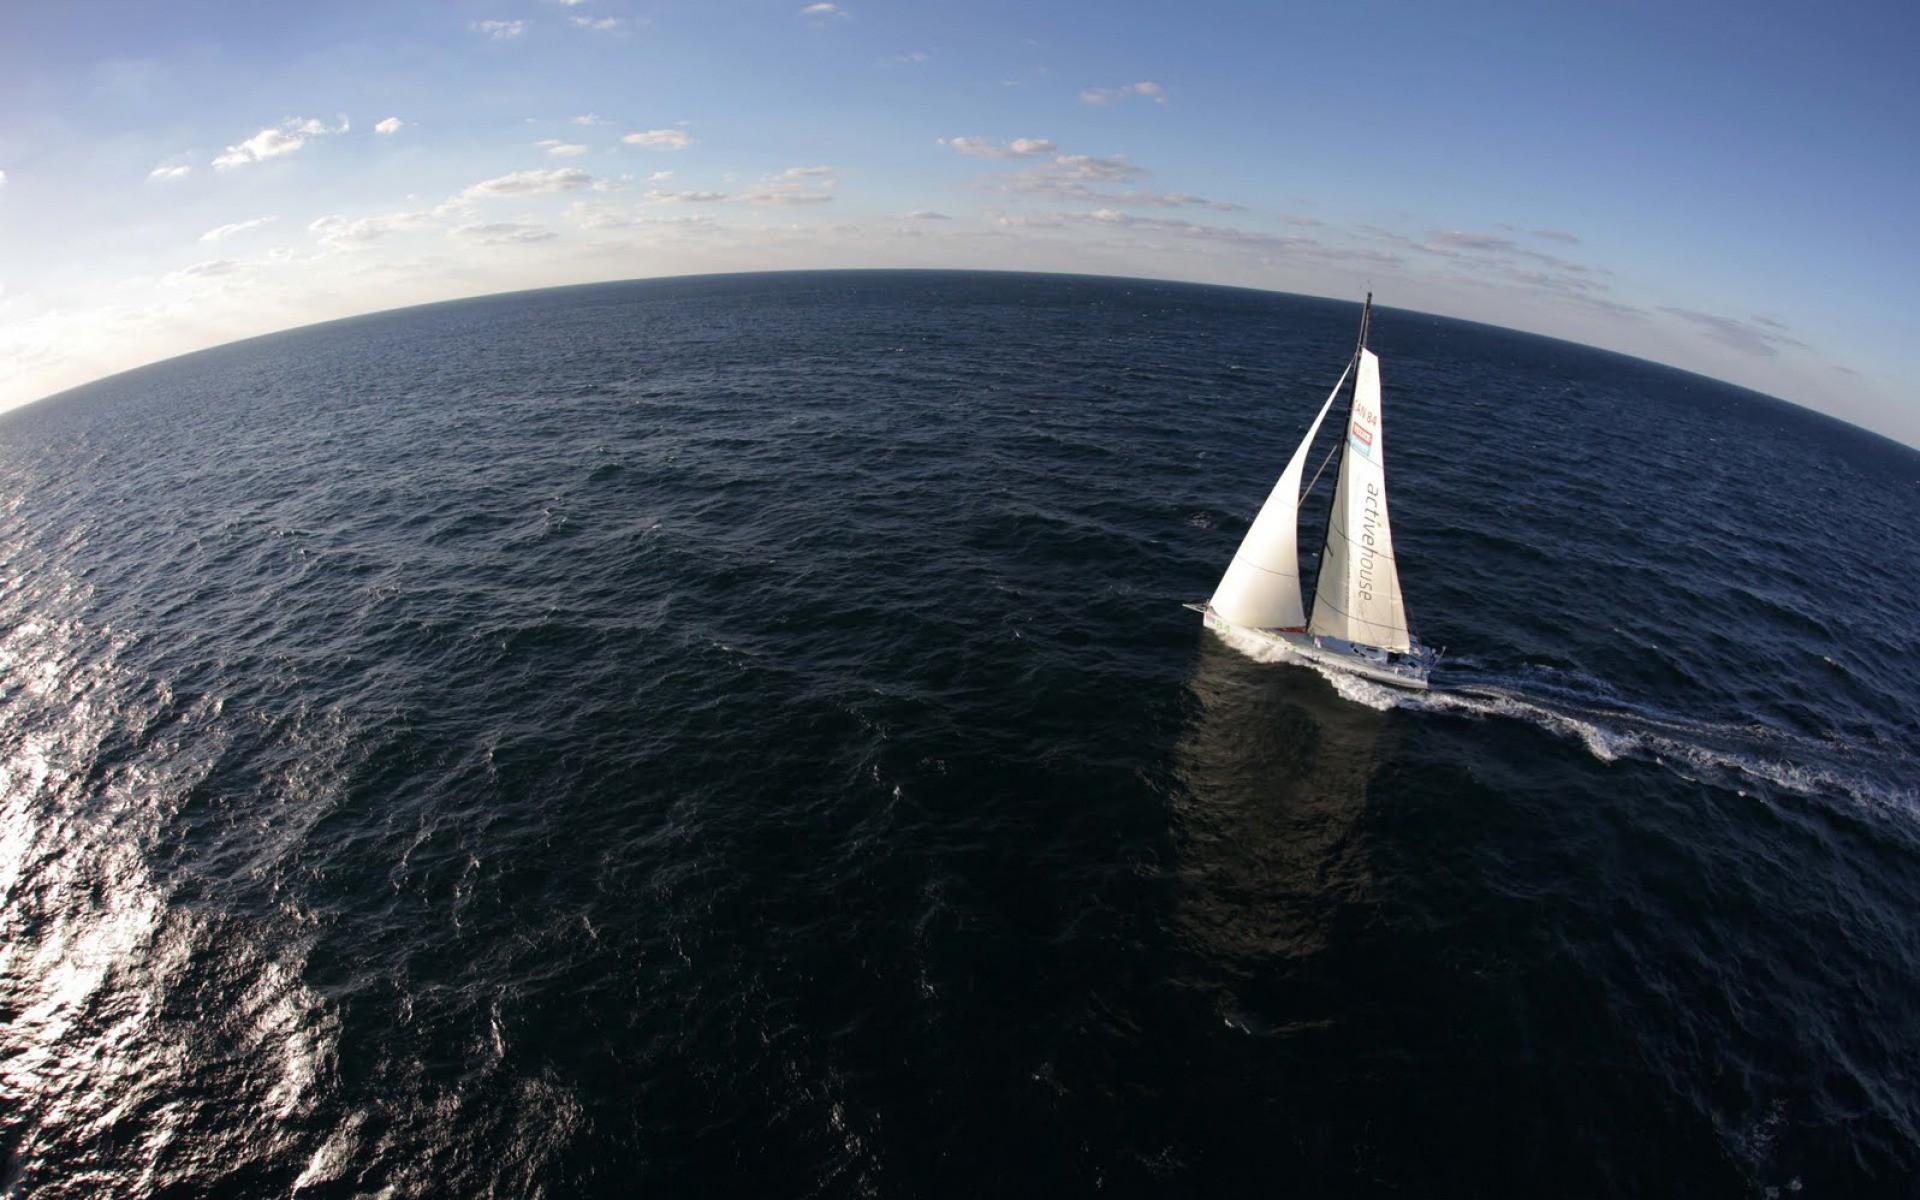 The vast ocean photo